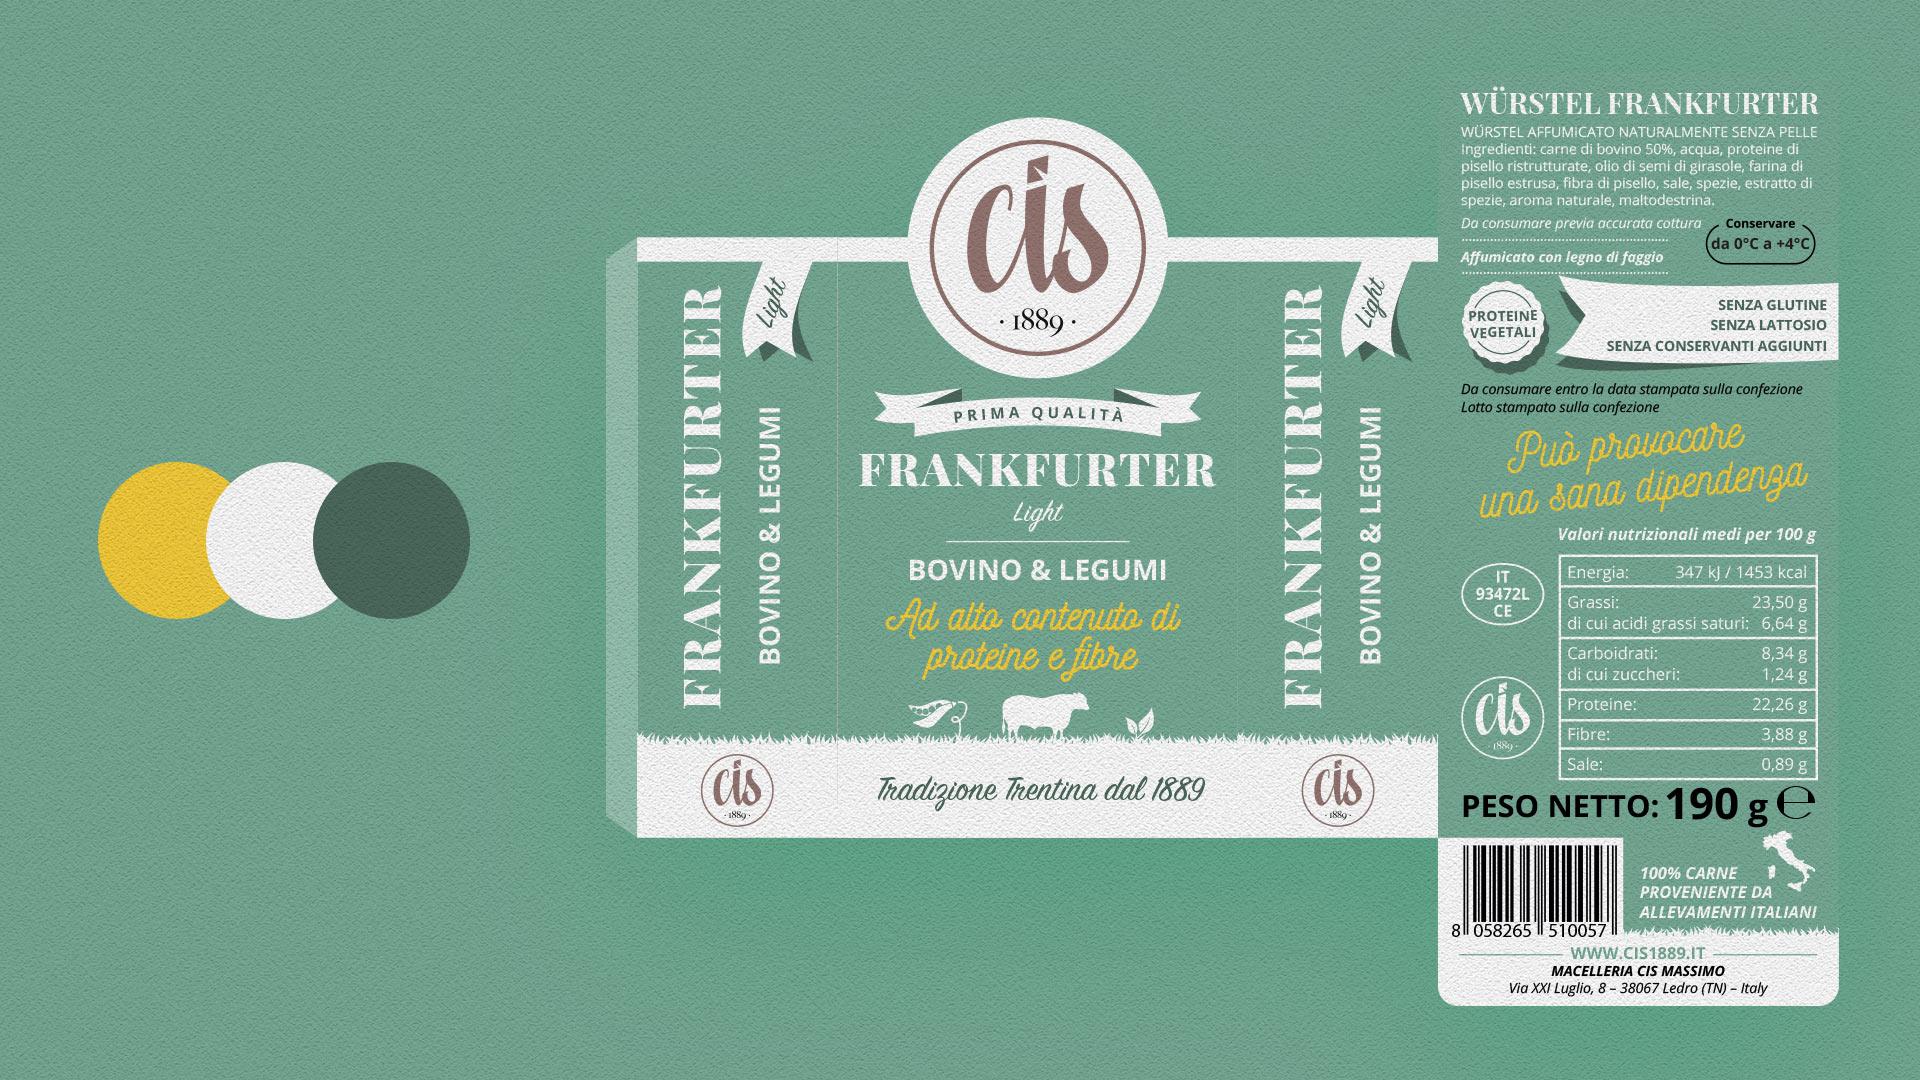 frankfurter bovino legumi CIS packaging grafico milano